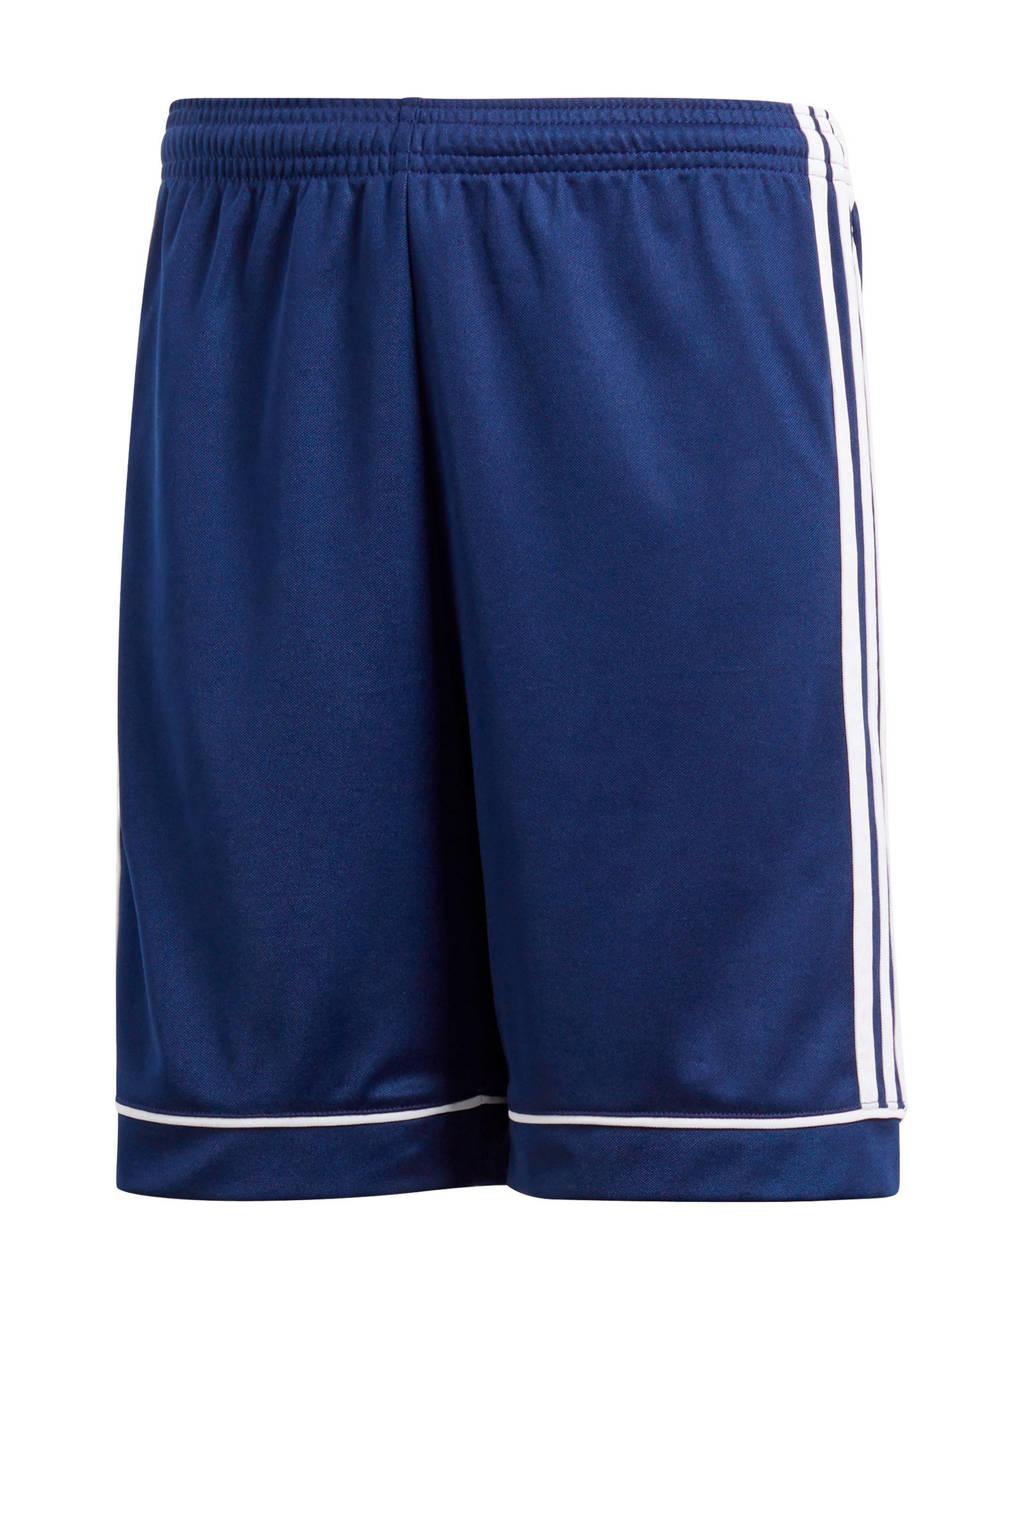 adidas Performance Junior  voetbalshort donkerblauw, Donkerblauw